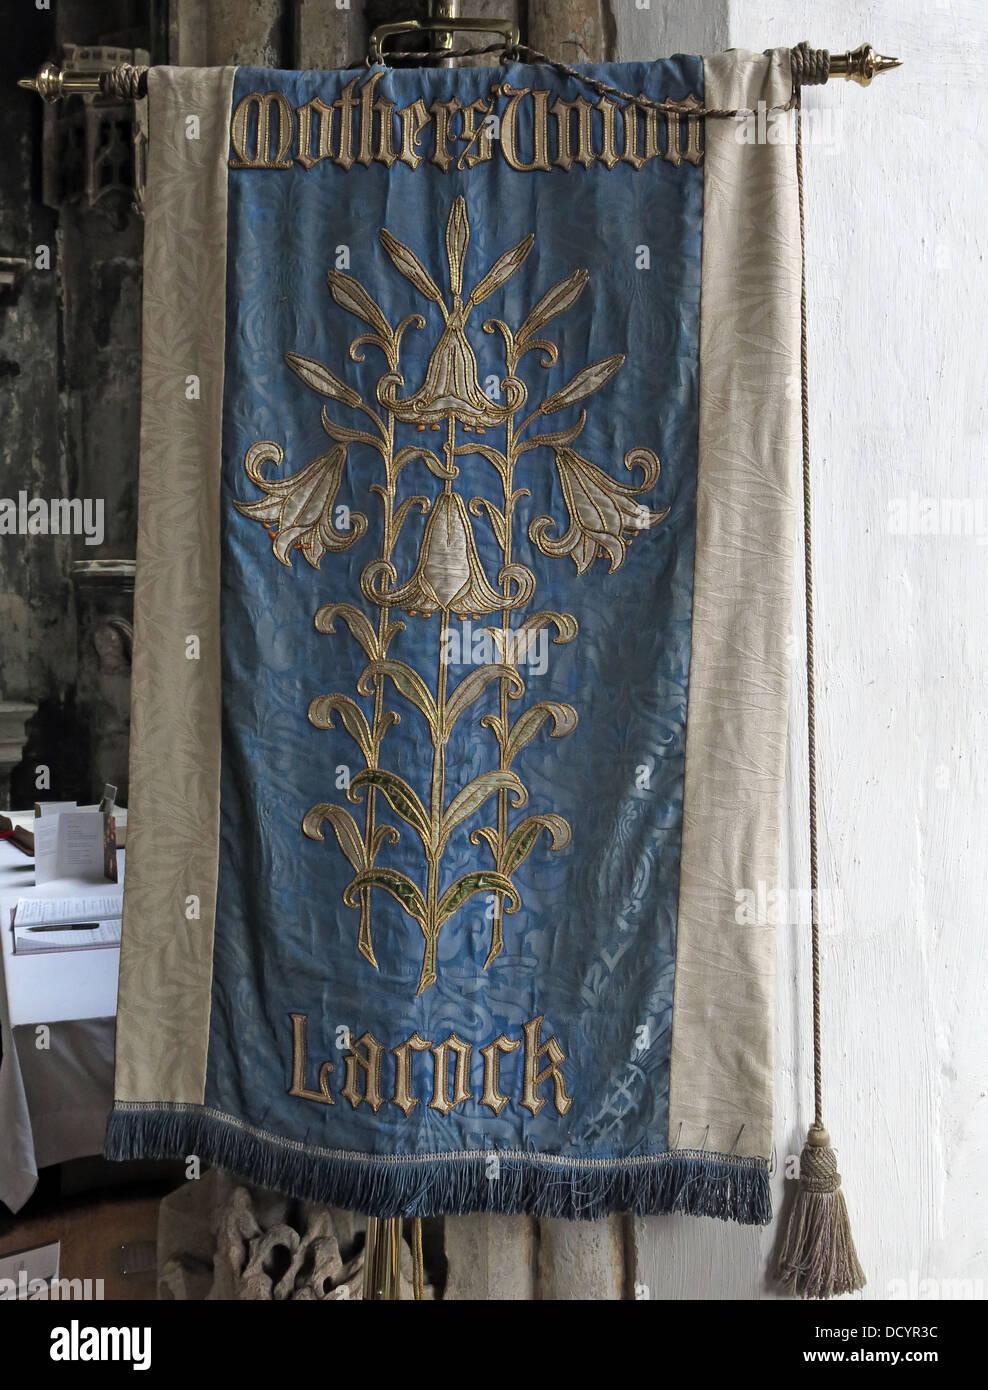 Dieses Stockfoto: Mütter Union Lacock Flagge, Lacock Abbey, Lacock, Wiltshire, England, SN 15. - DCYR3C